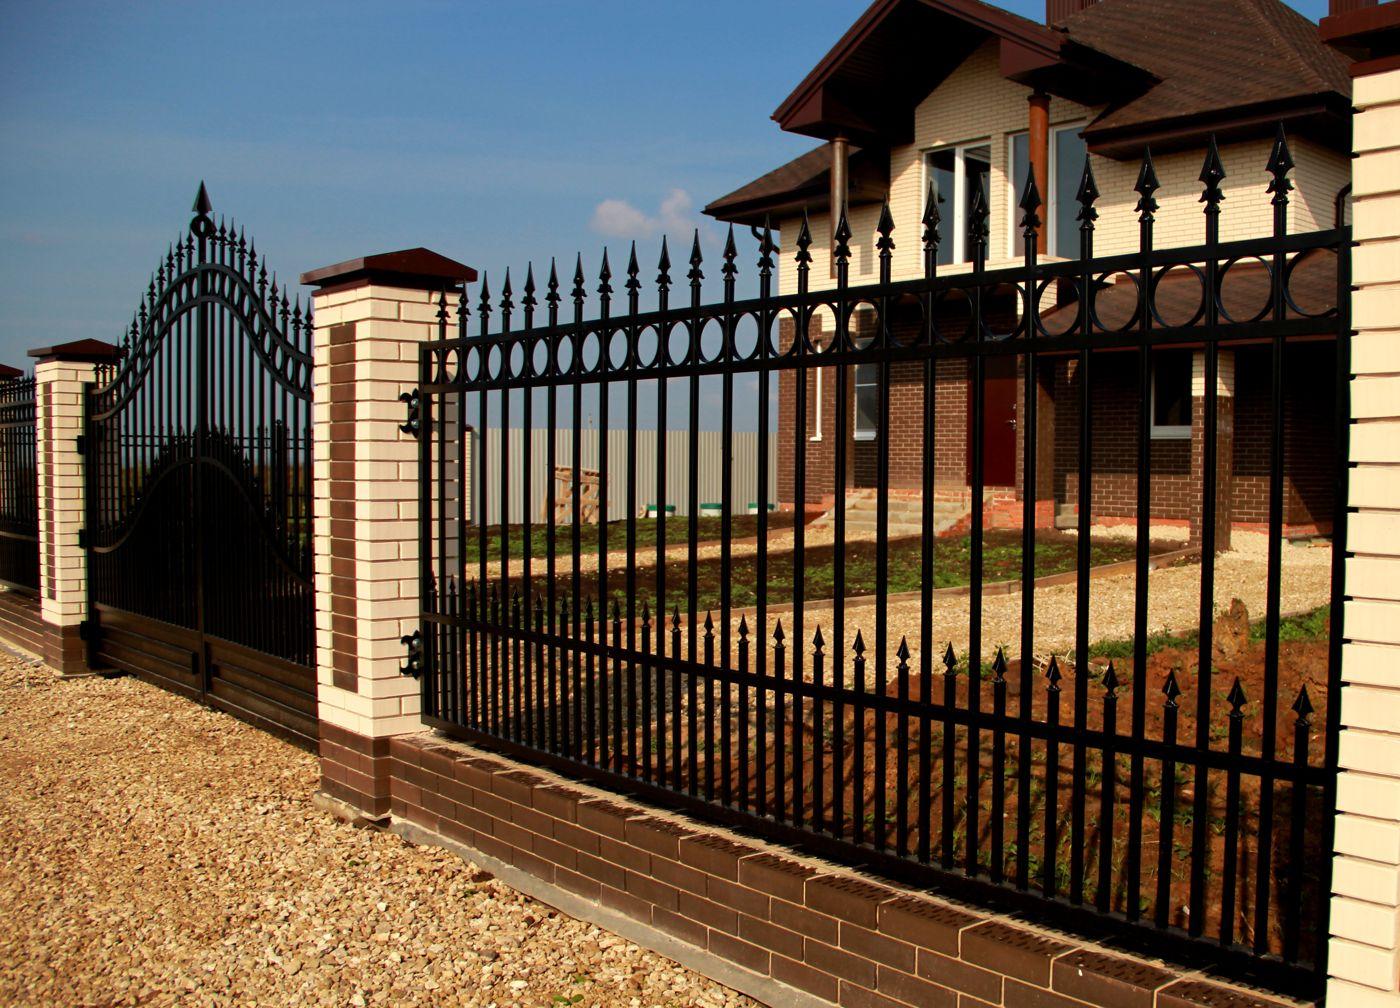 Забор решеткой своими руками фото 170